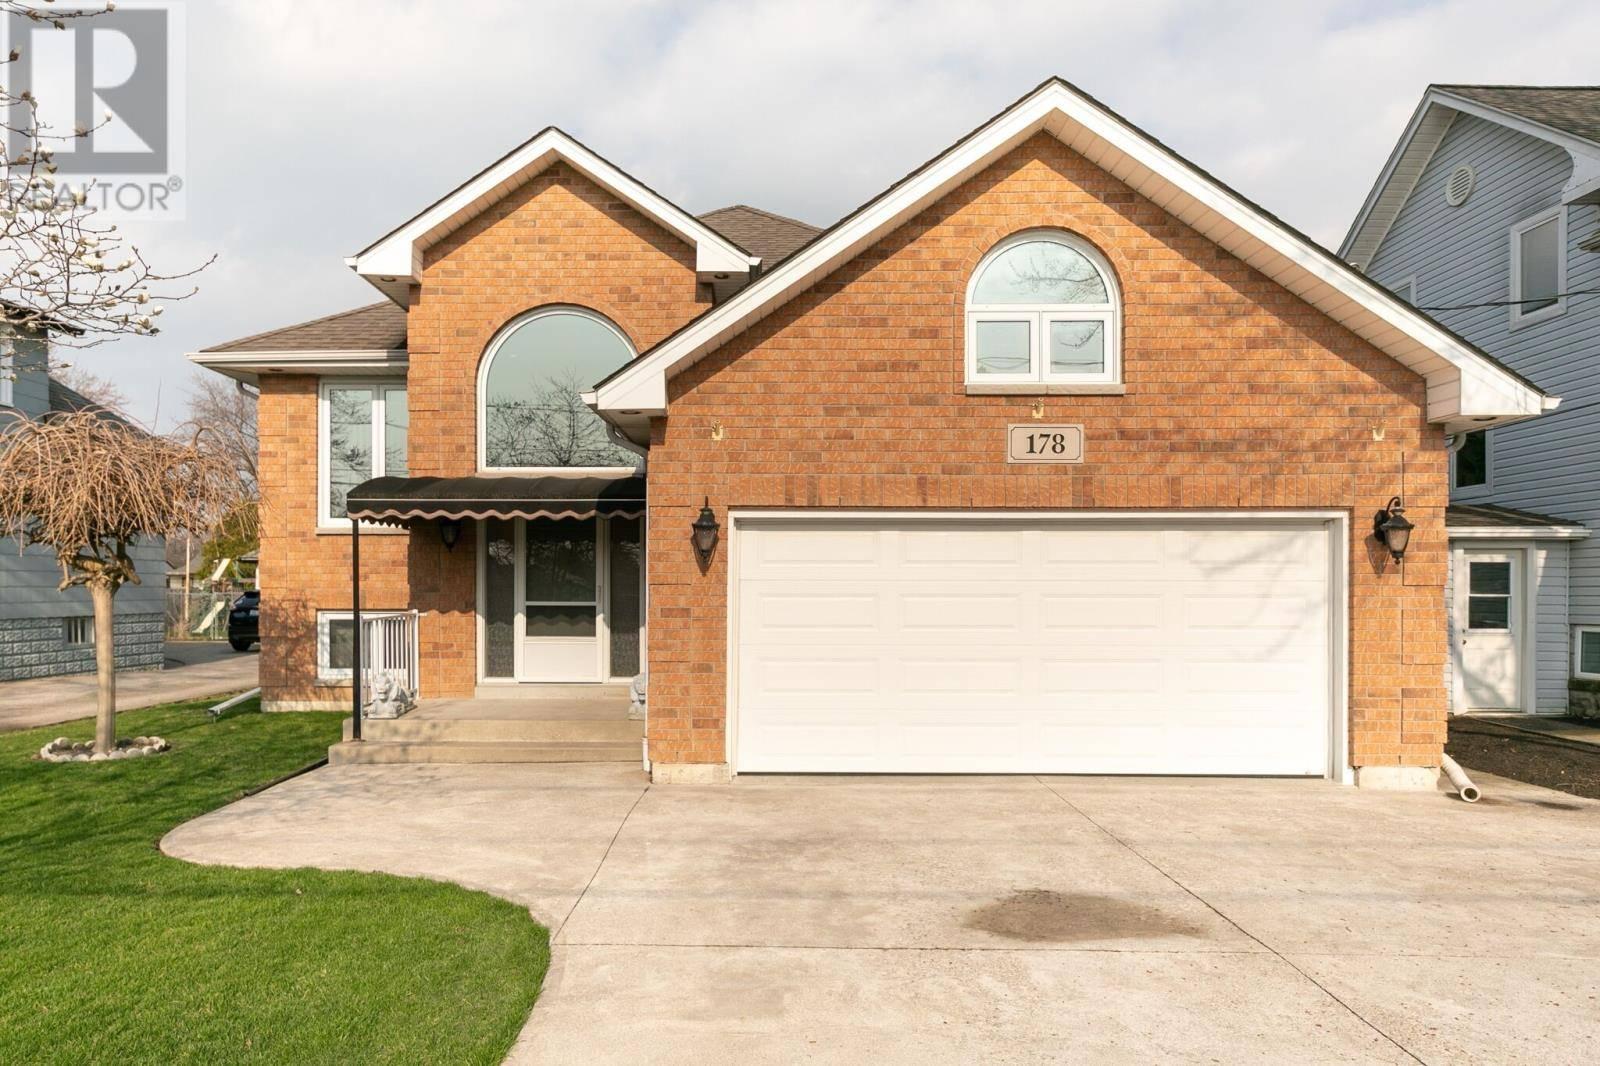 House for sale at 178 Lesperance  Tecumseh Ontario - MLS: 20004099